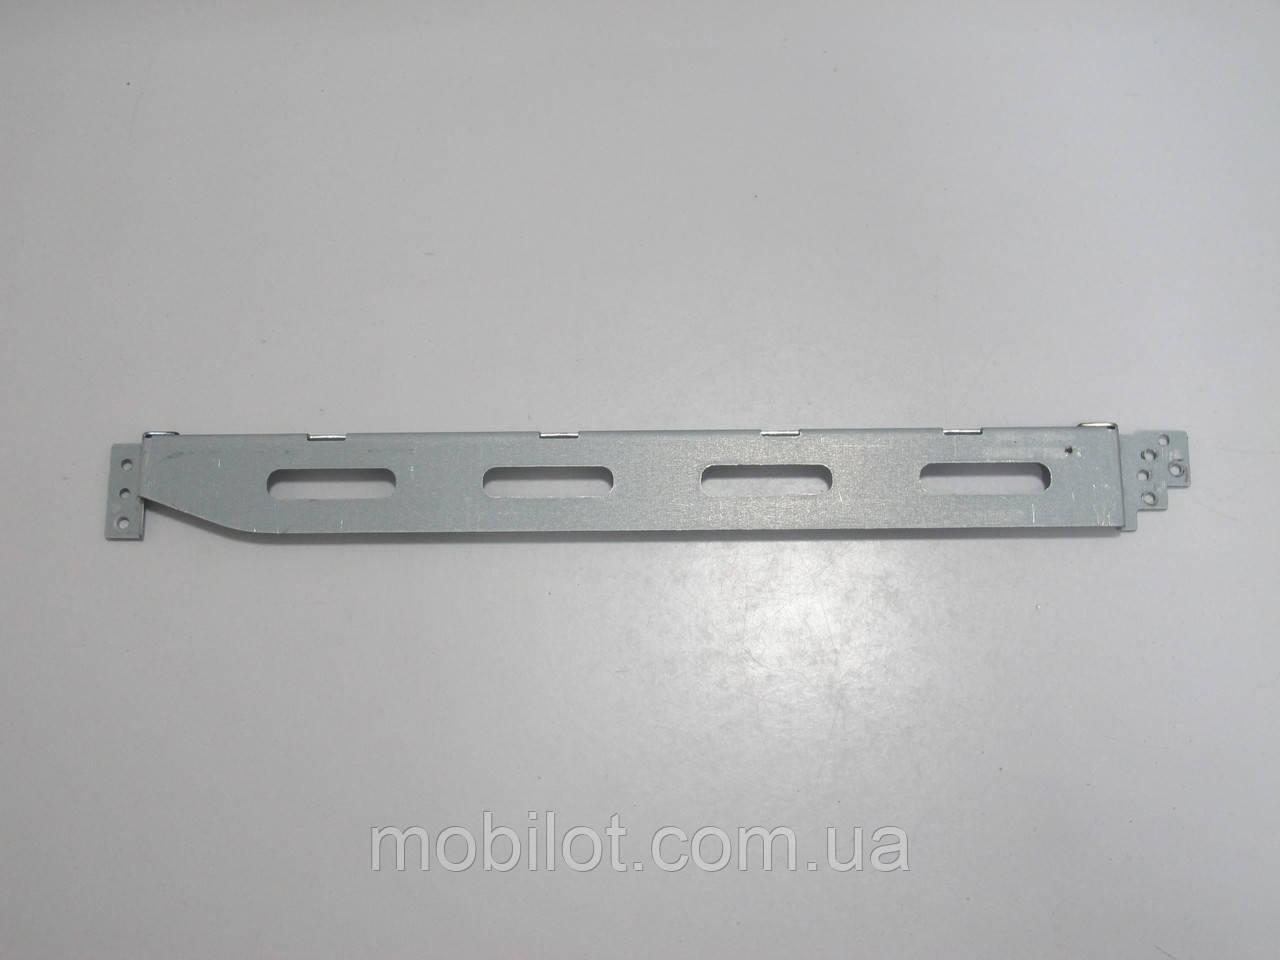 Направляющая Samsung R60 Plus (NZ-5466)